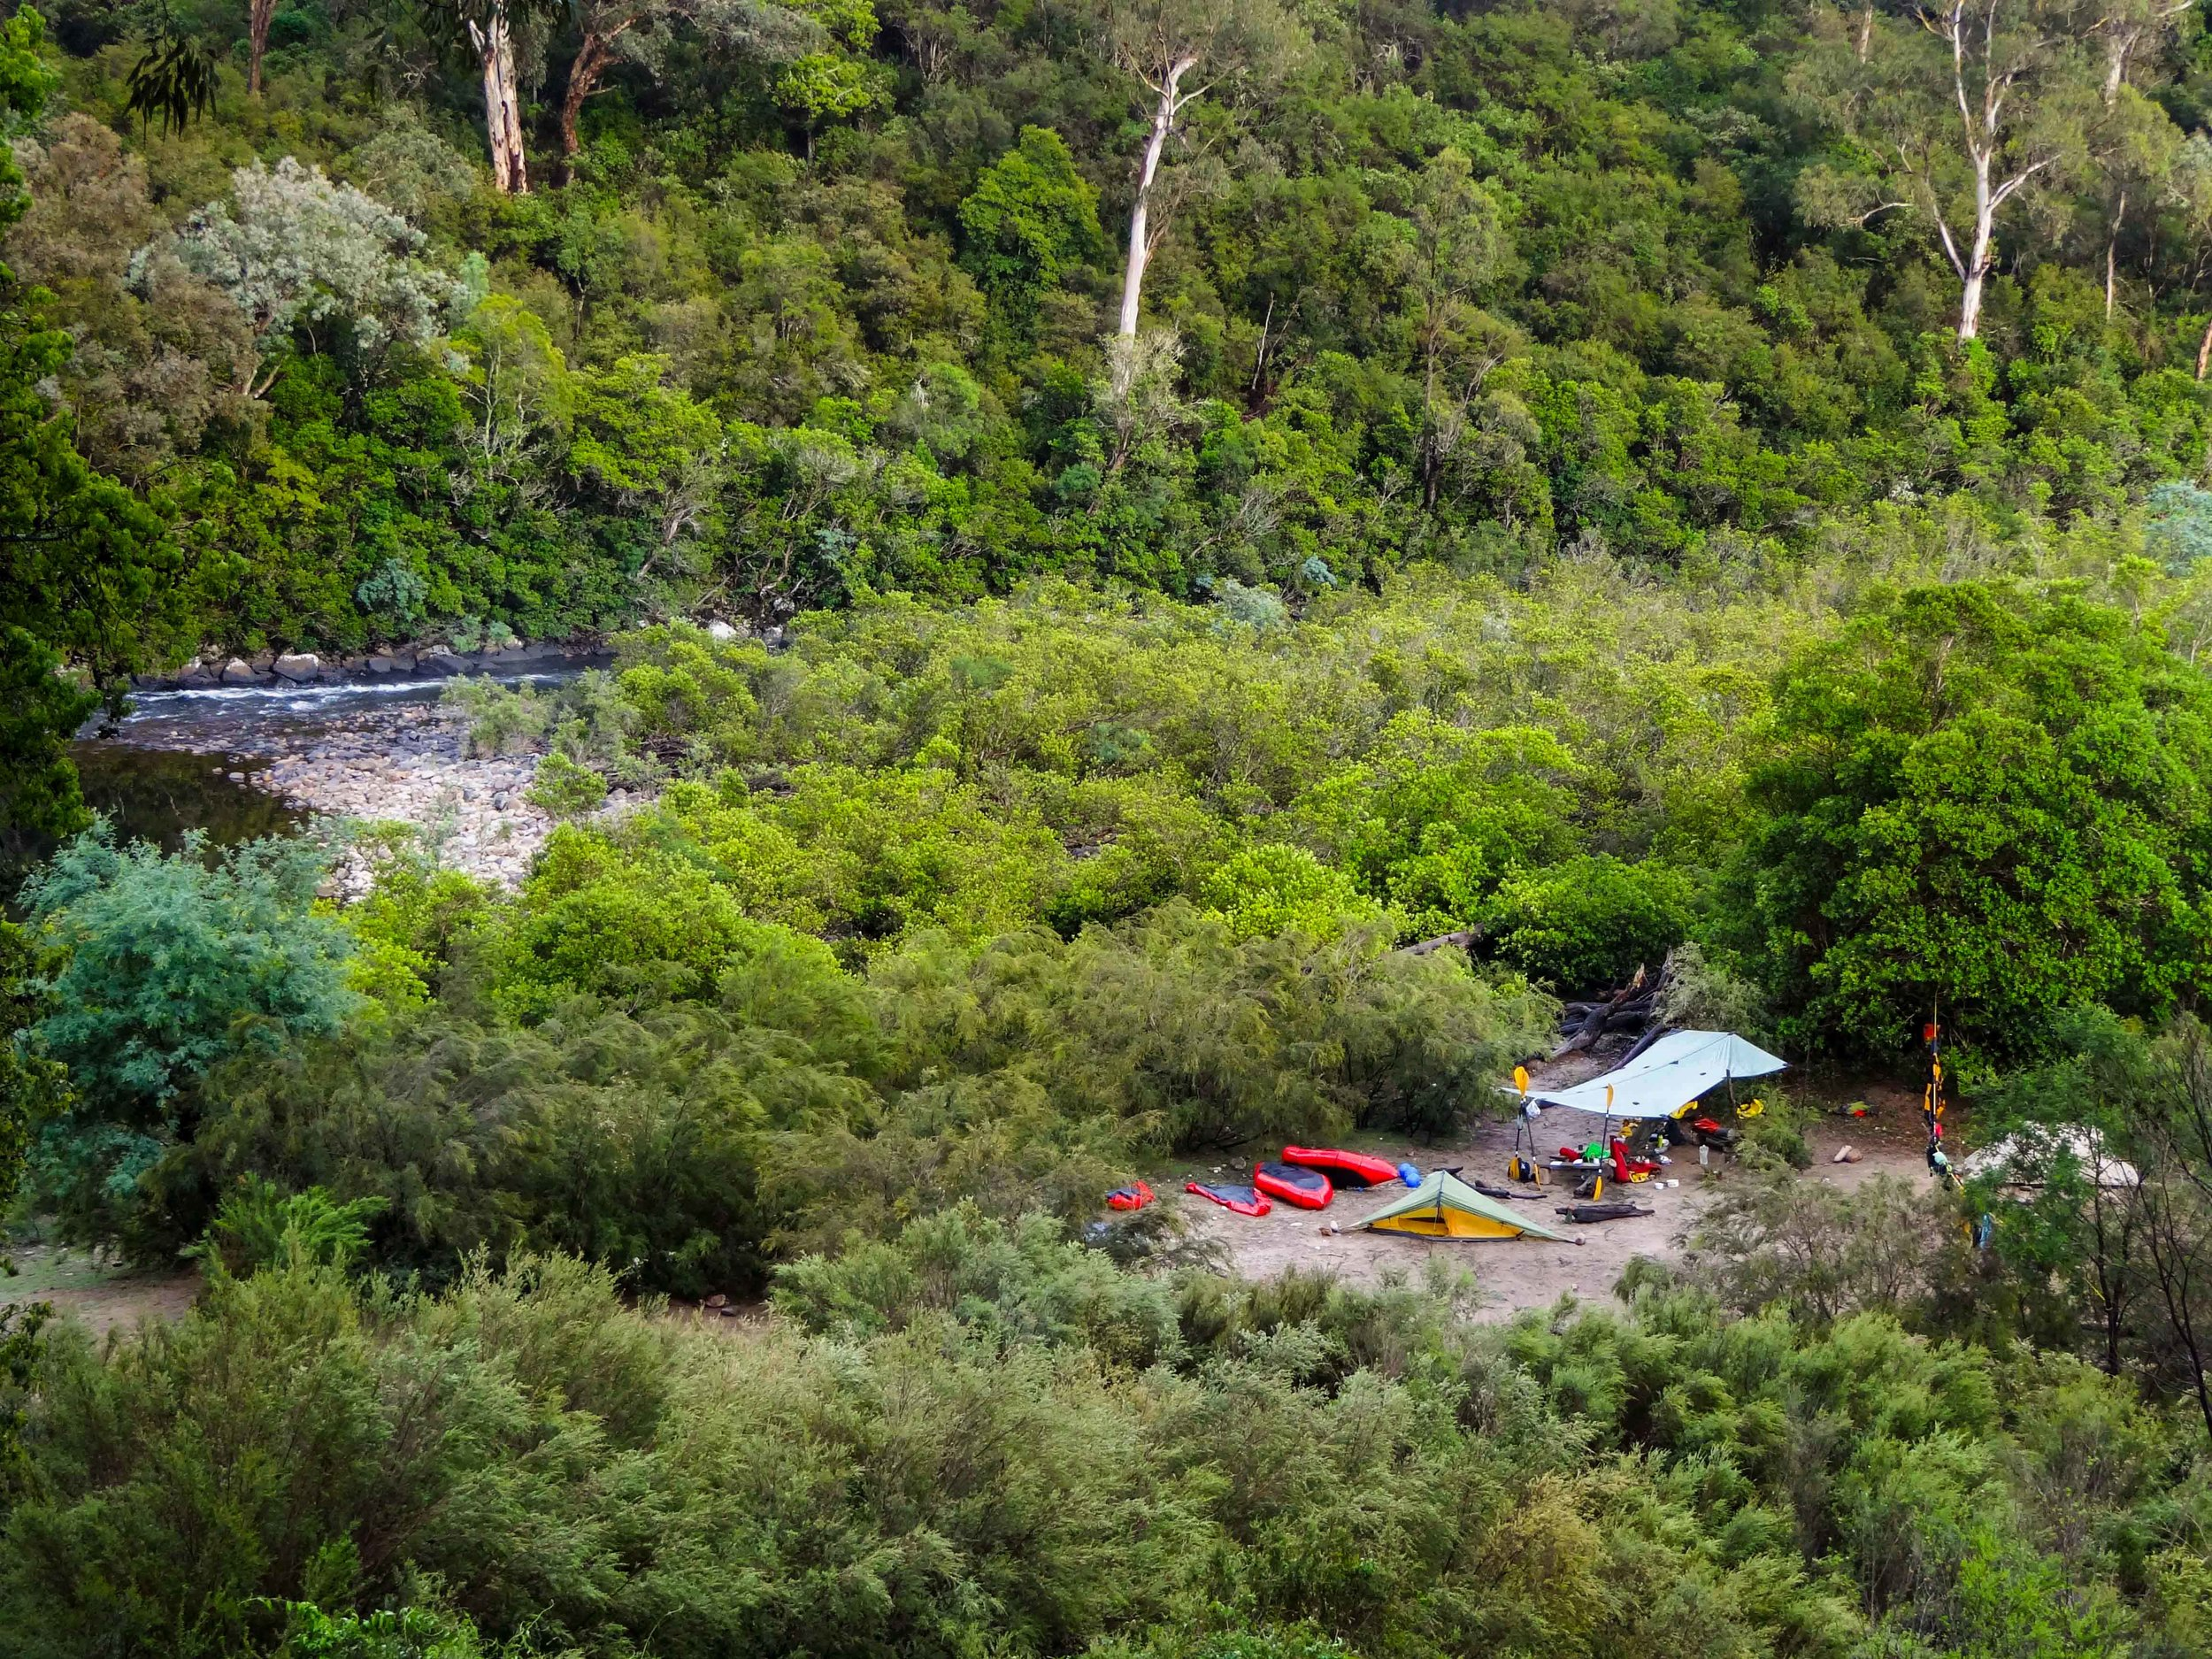 Pack_Raft_Australia_Riverside_Camp_Mitchell_River_Alpacka_Raft.jpg